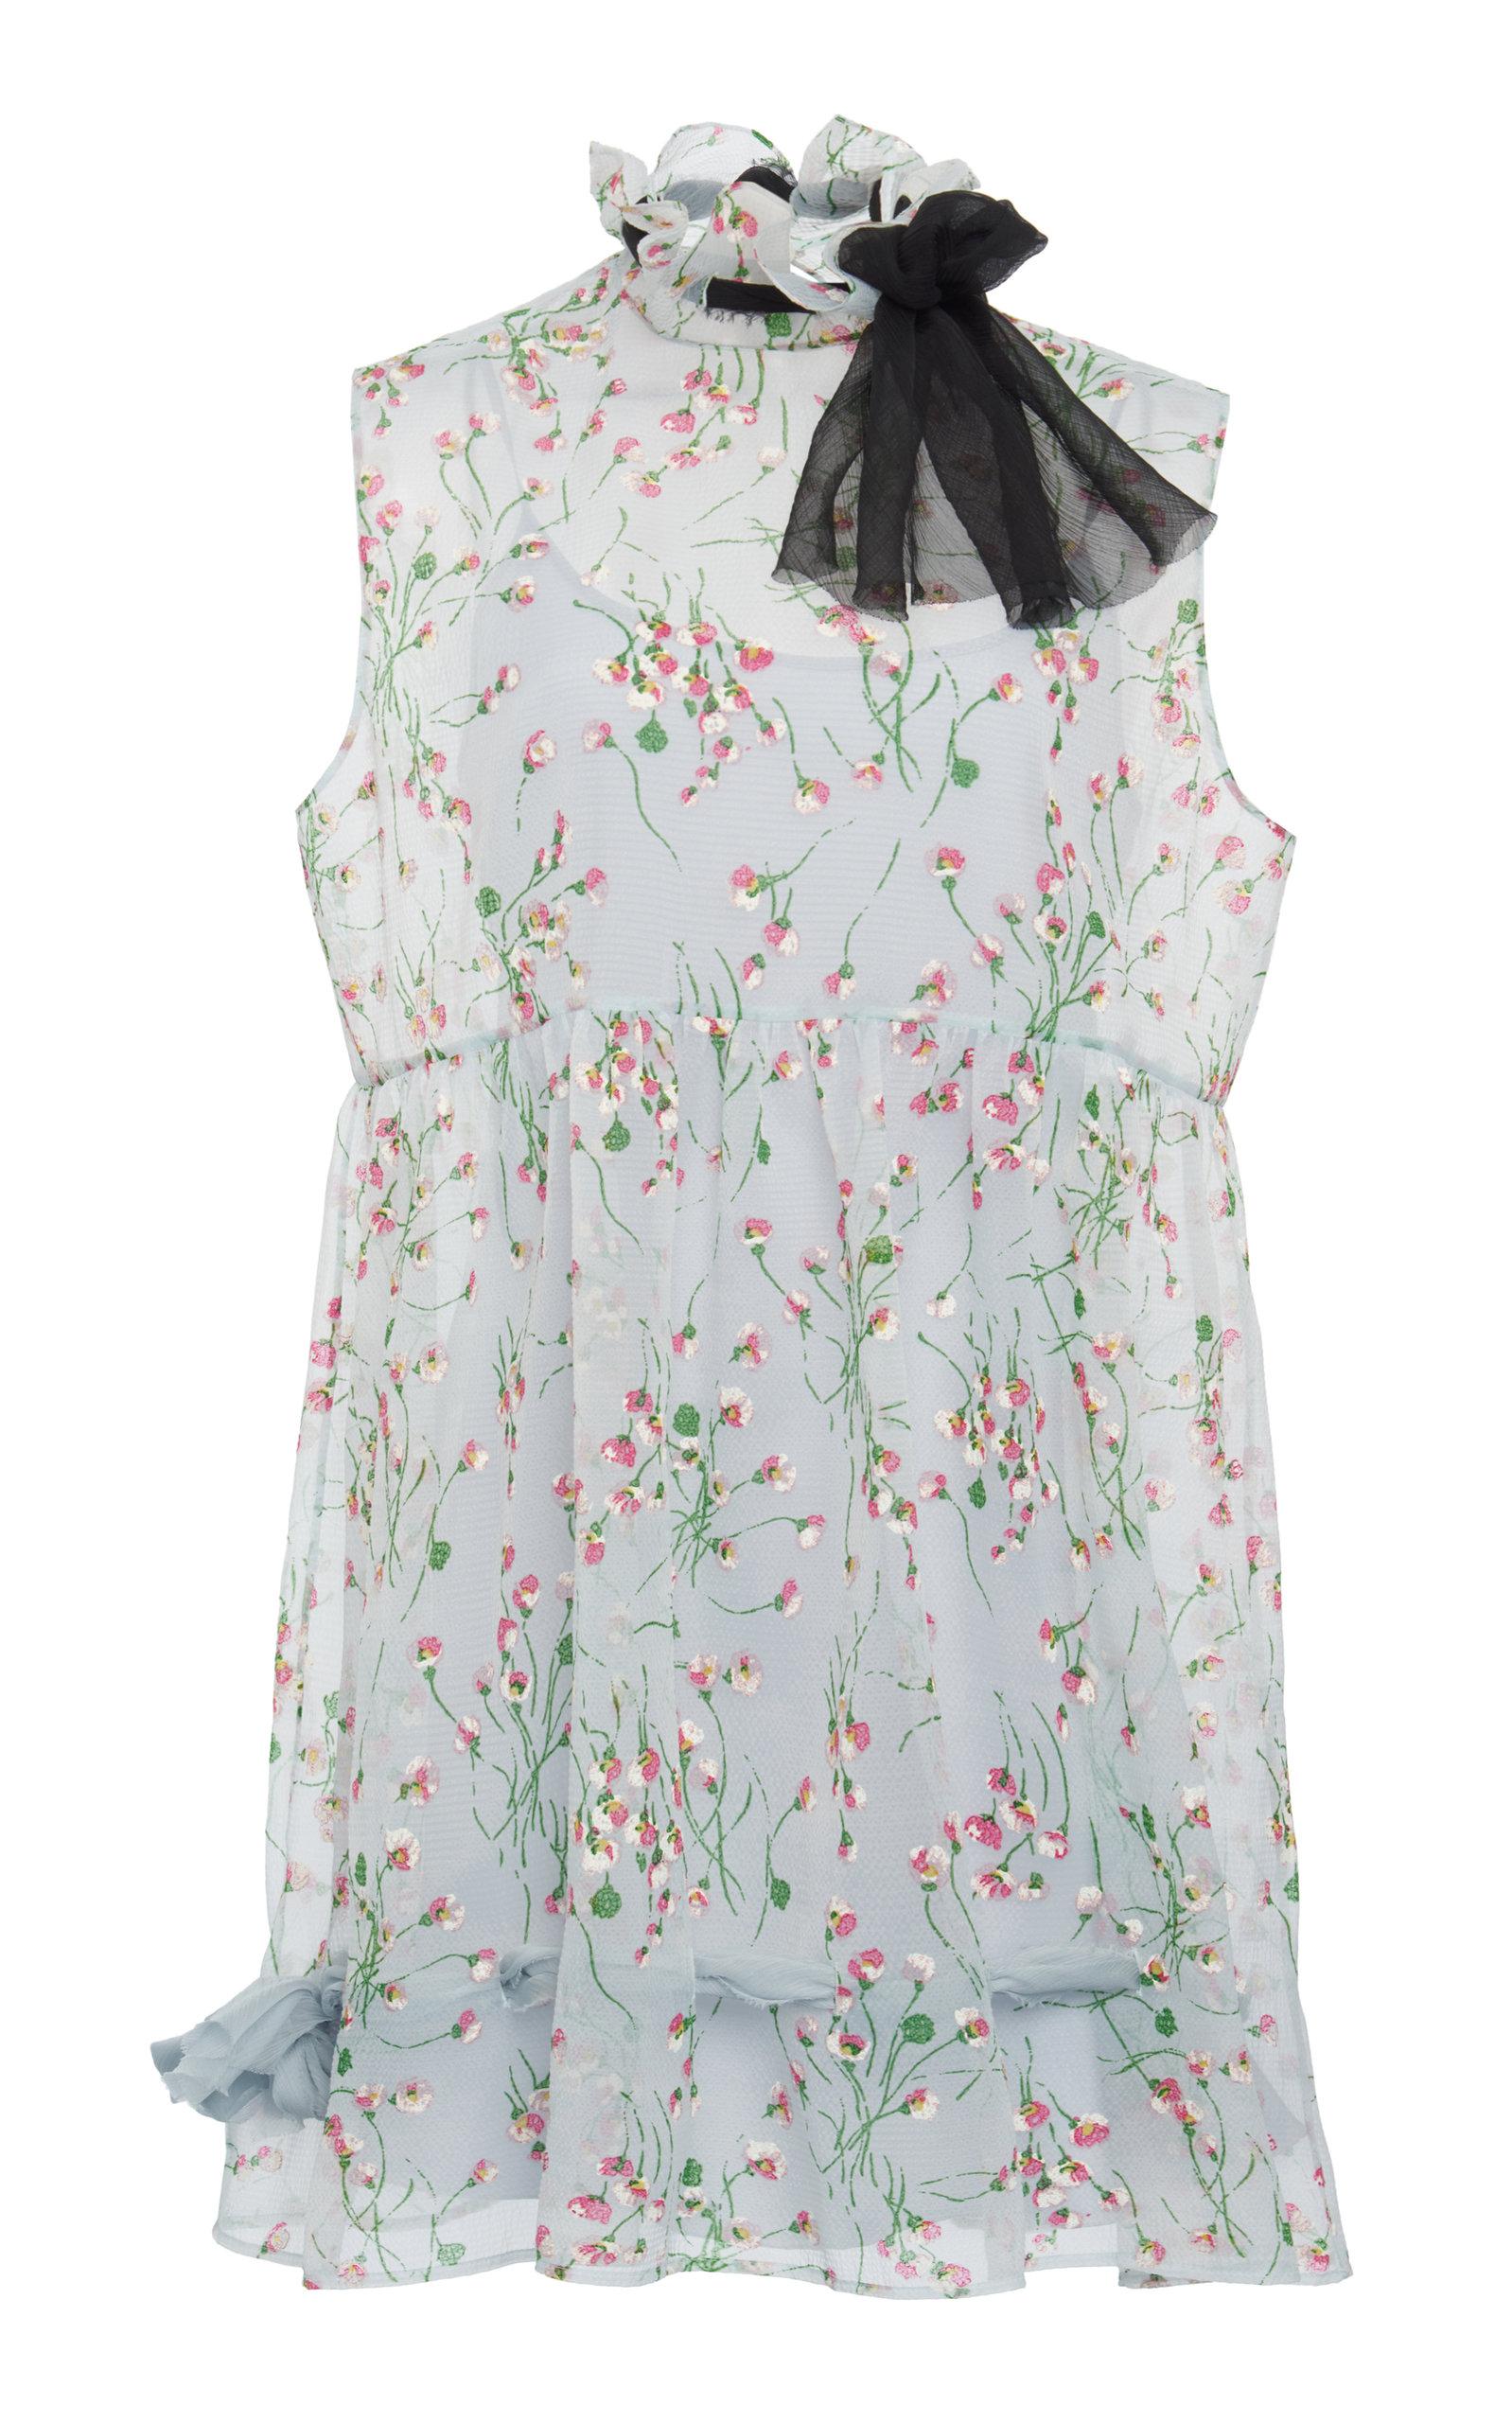 Buy Miu Miu Tie-Detailed Floral-Print Georgette Mini Dress online, shop Miu Miu at the best price